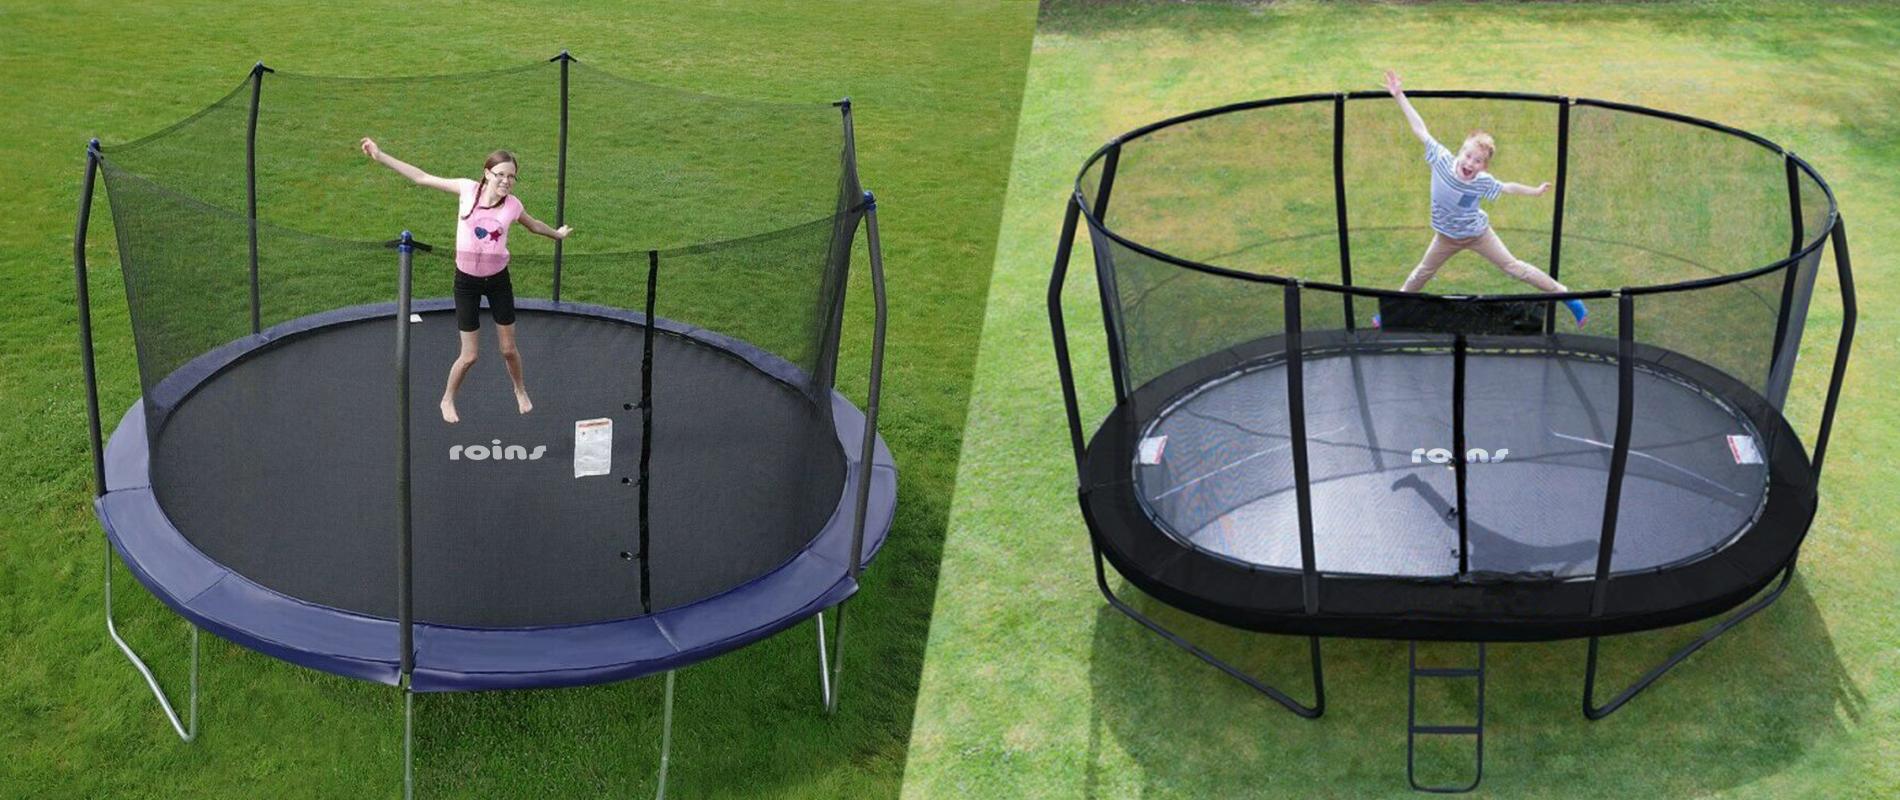 oval vs round trampoline